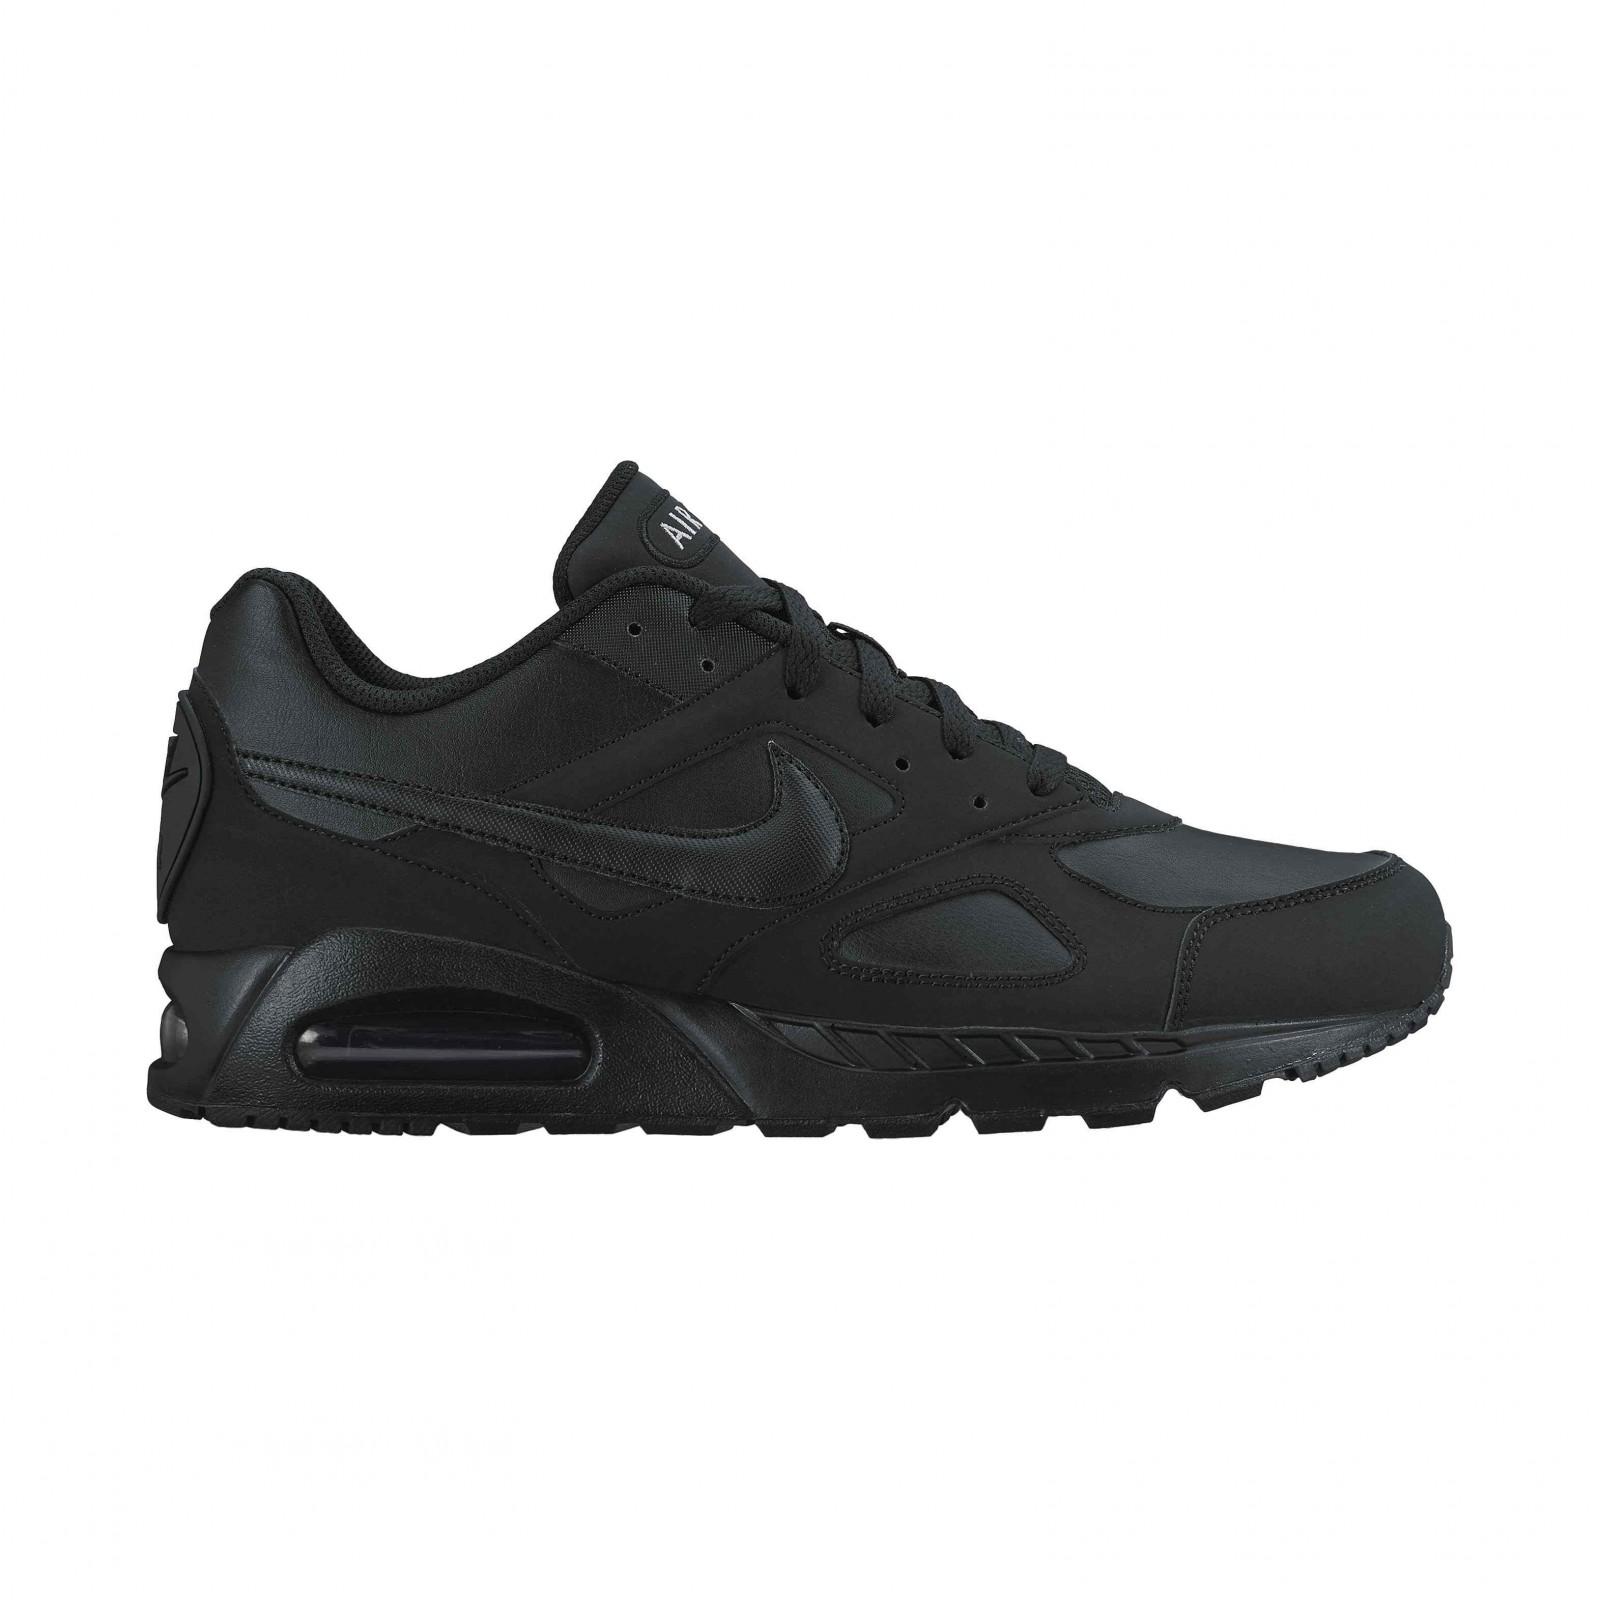 Pánské Tenisky Nike AIR MAX IVO LTR BLACK BLACK-BLACK-BLACK - Glami.sk 628775c73ac